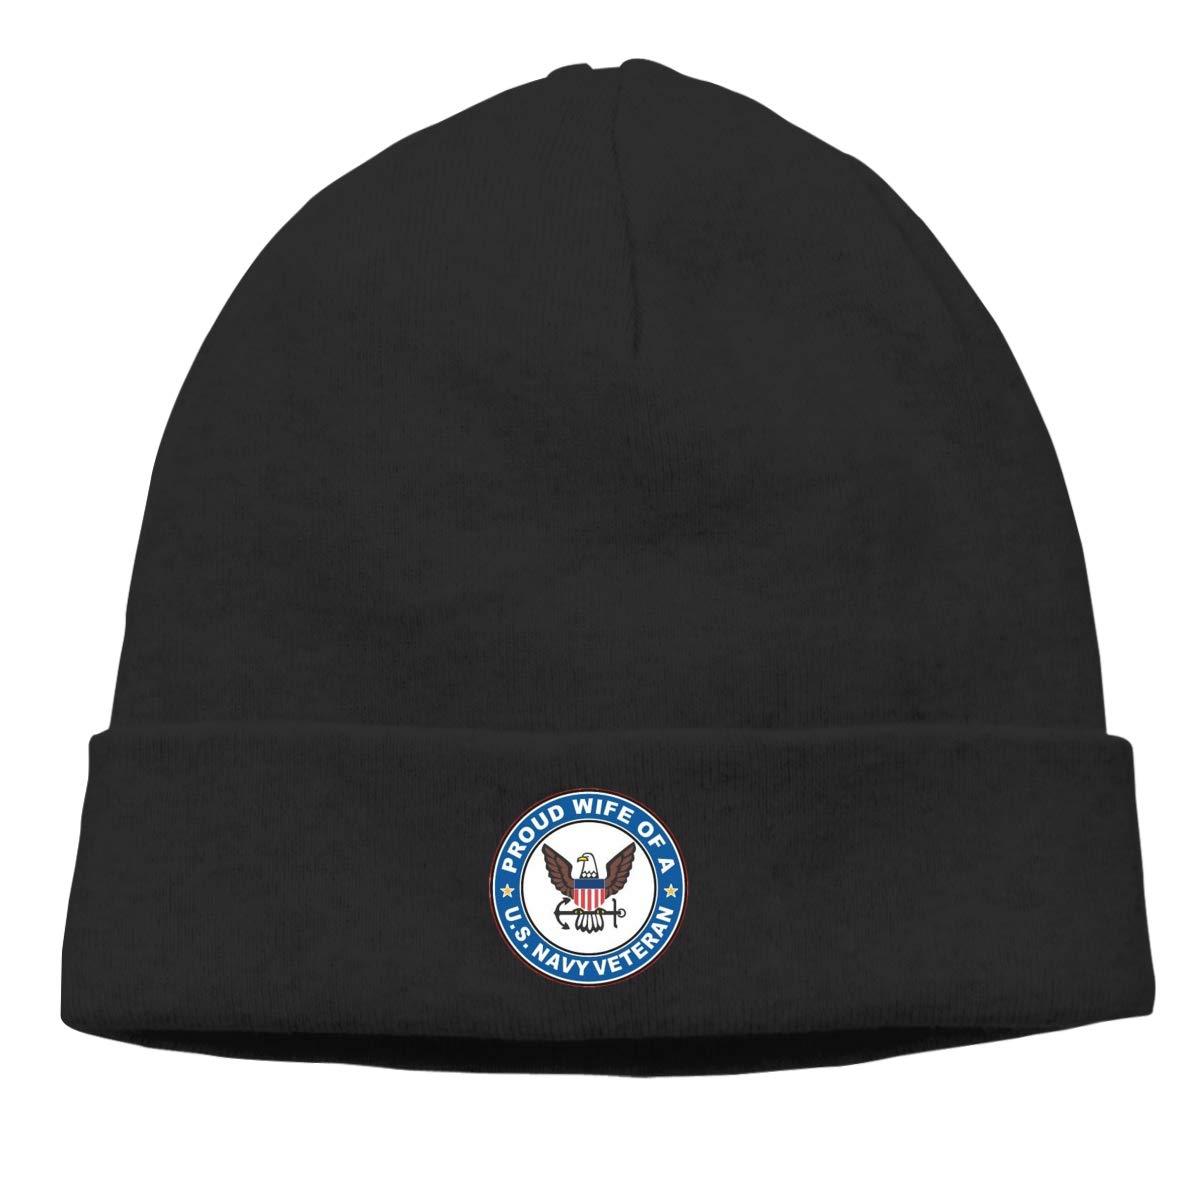 Nskngr US Navy Veteran Proud Wife Mens/&Womens Stretchy /& Soft Knit Cap Skully